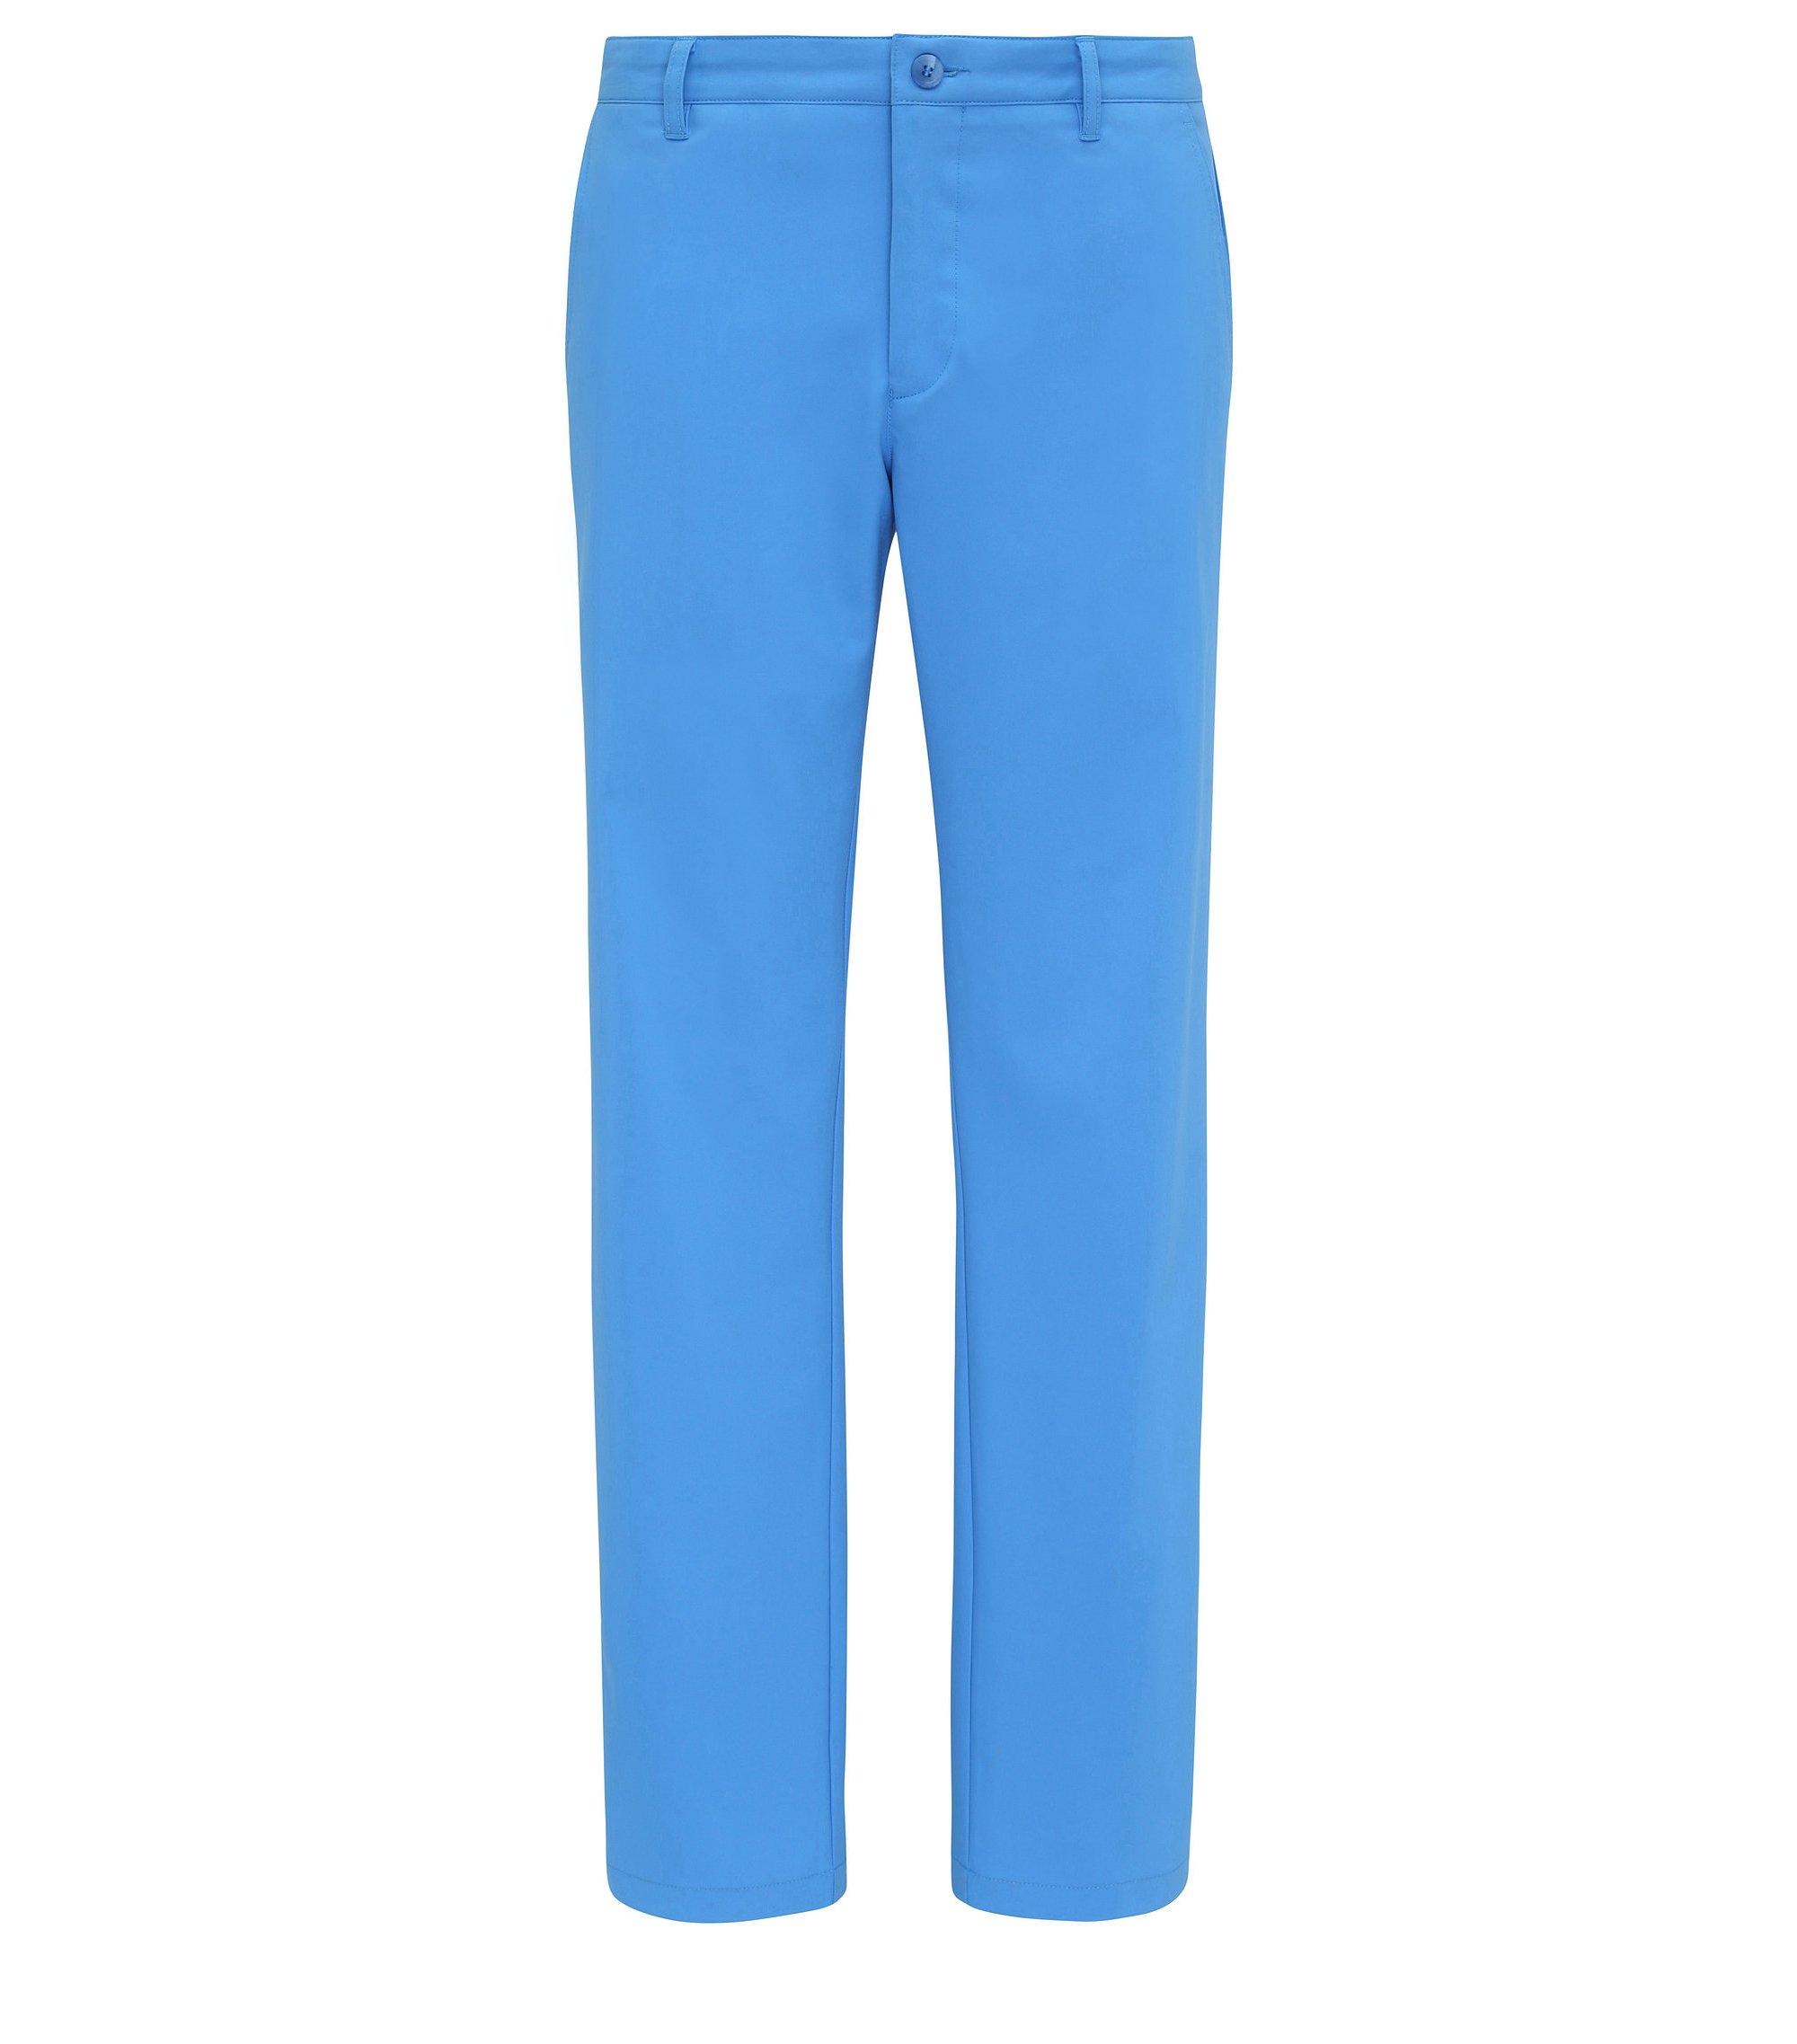 CoolMax Performance Golf Pants, Slim Fit   Hakan, Blue